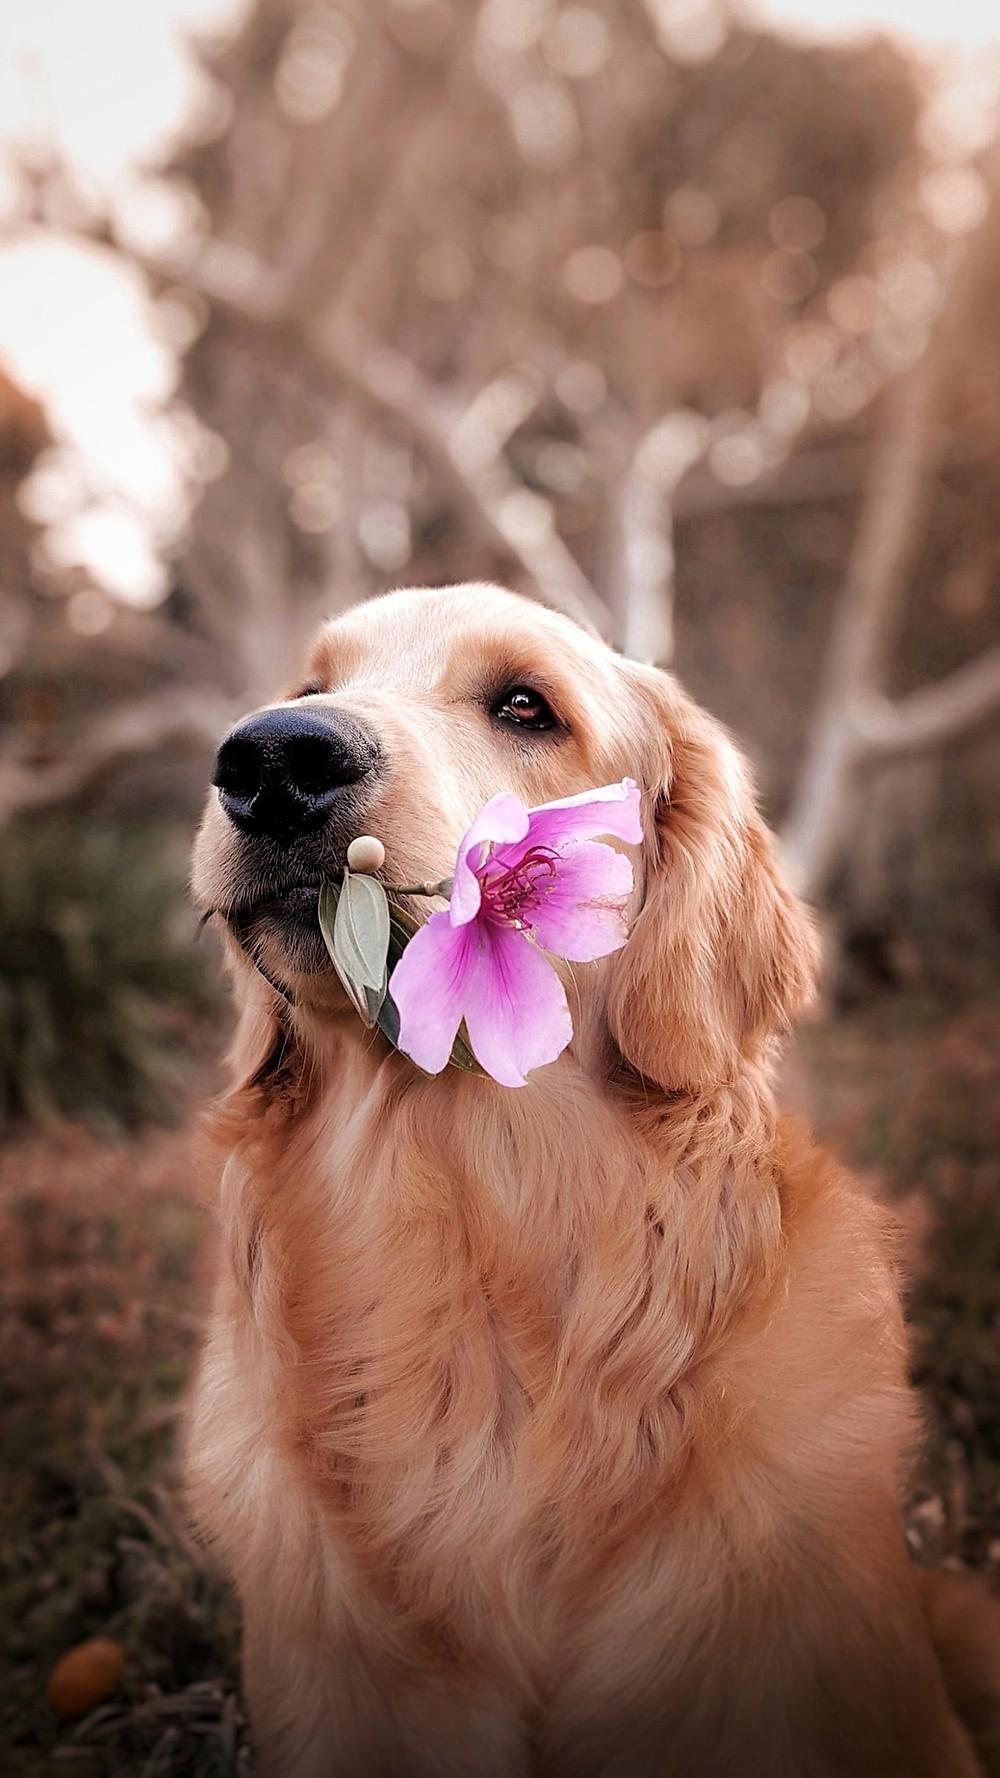 dog holding a flower